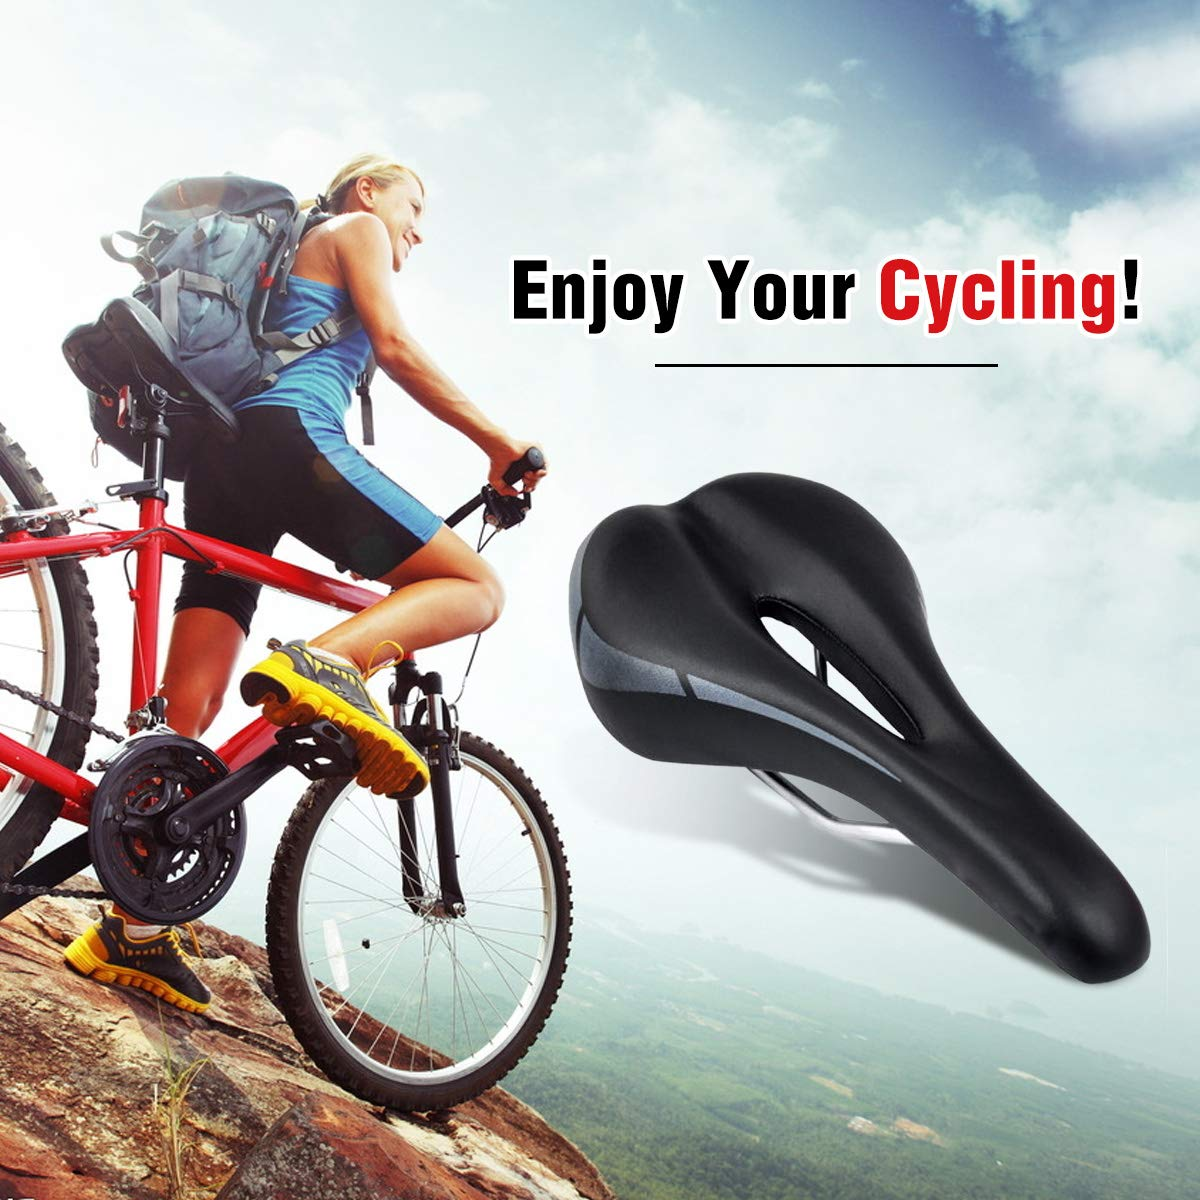 OUTERDO Fahrradsattel MTB Fahrradsitz Gel Mountainbike Sattel City Tourensattel Trekking Rennrad Sattel